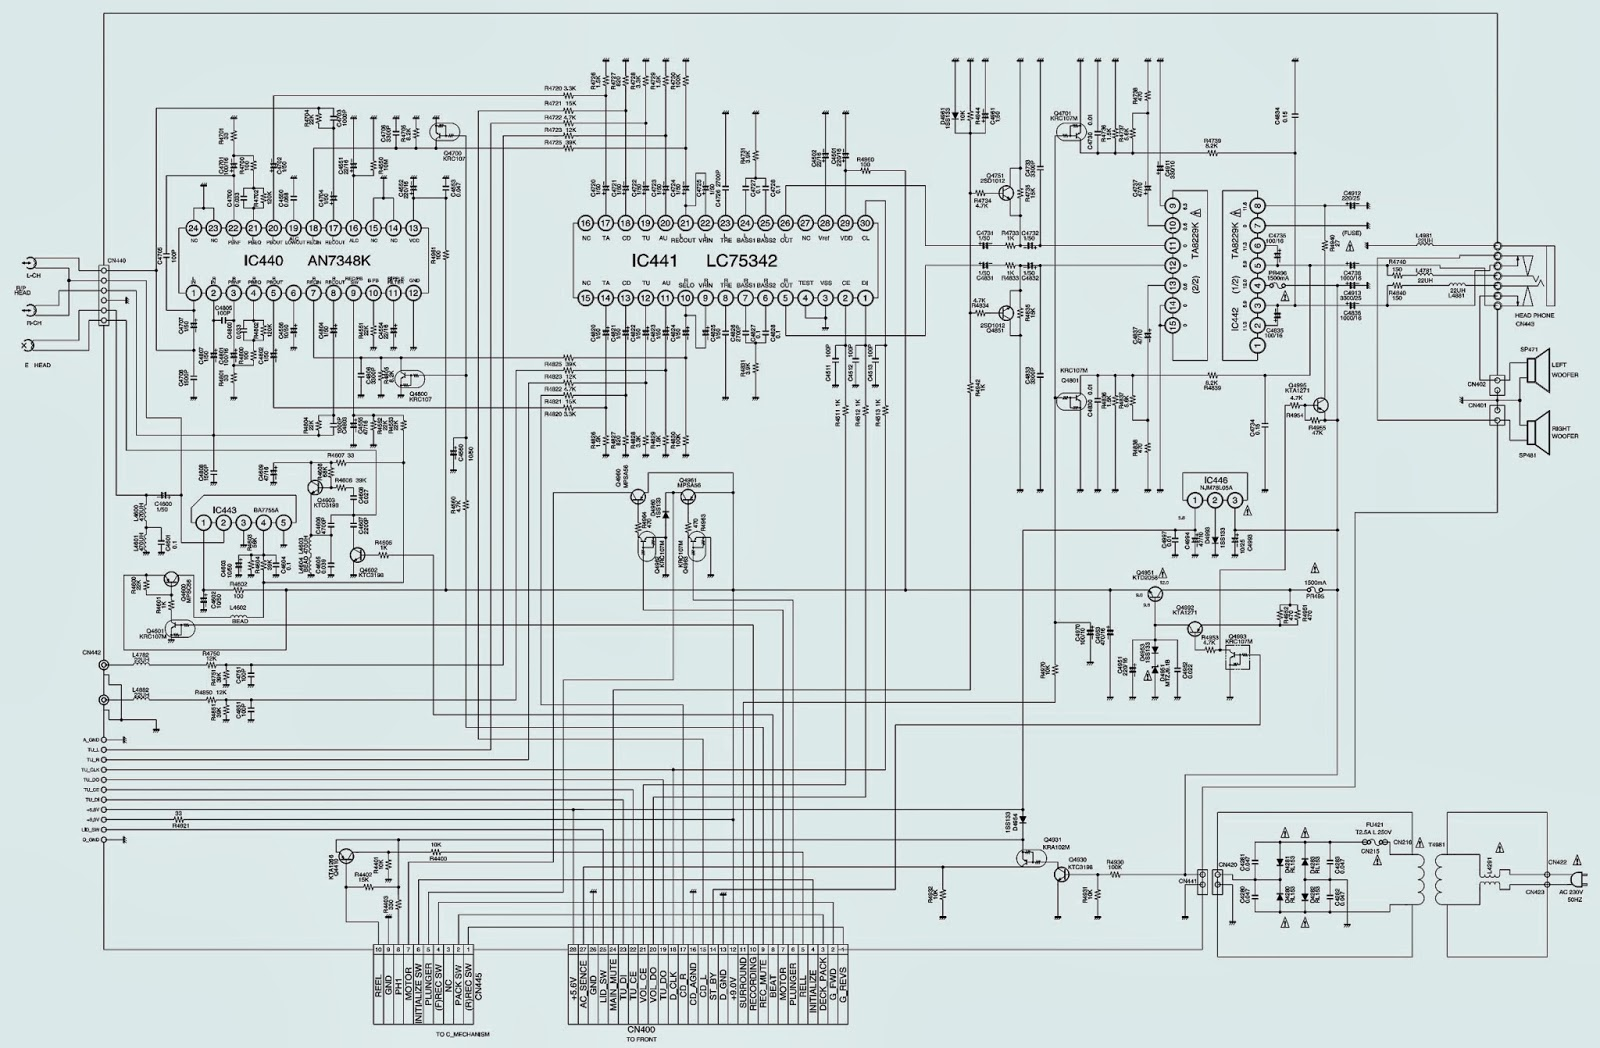 sanyo dc-da2000 - schematic  circuit diagram